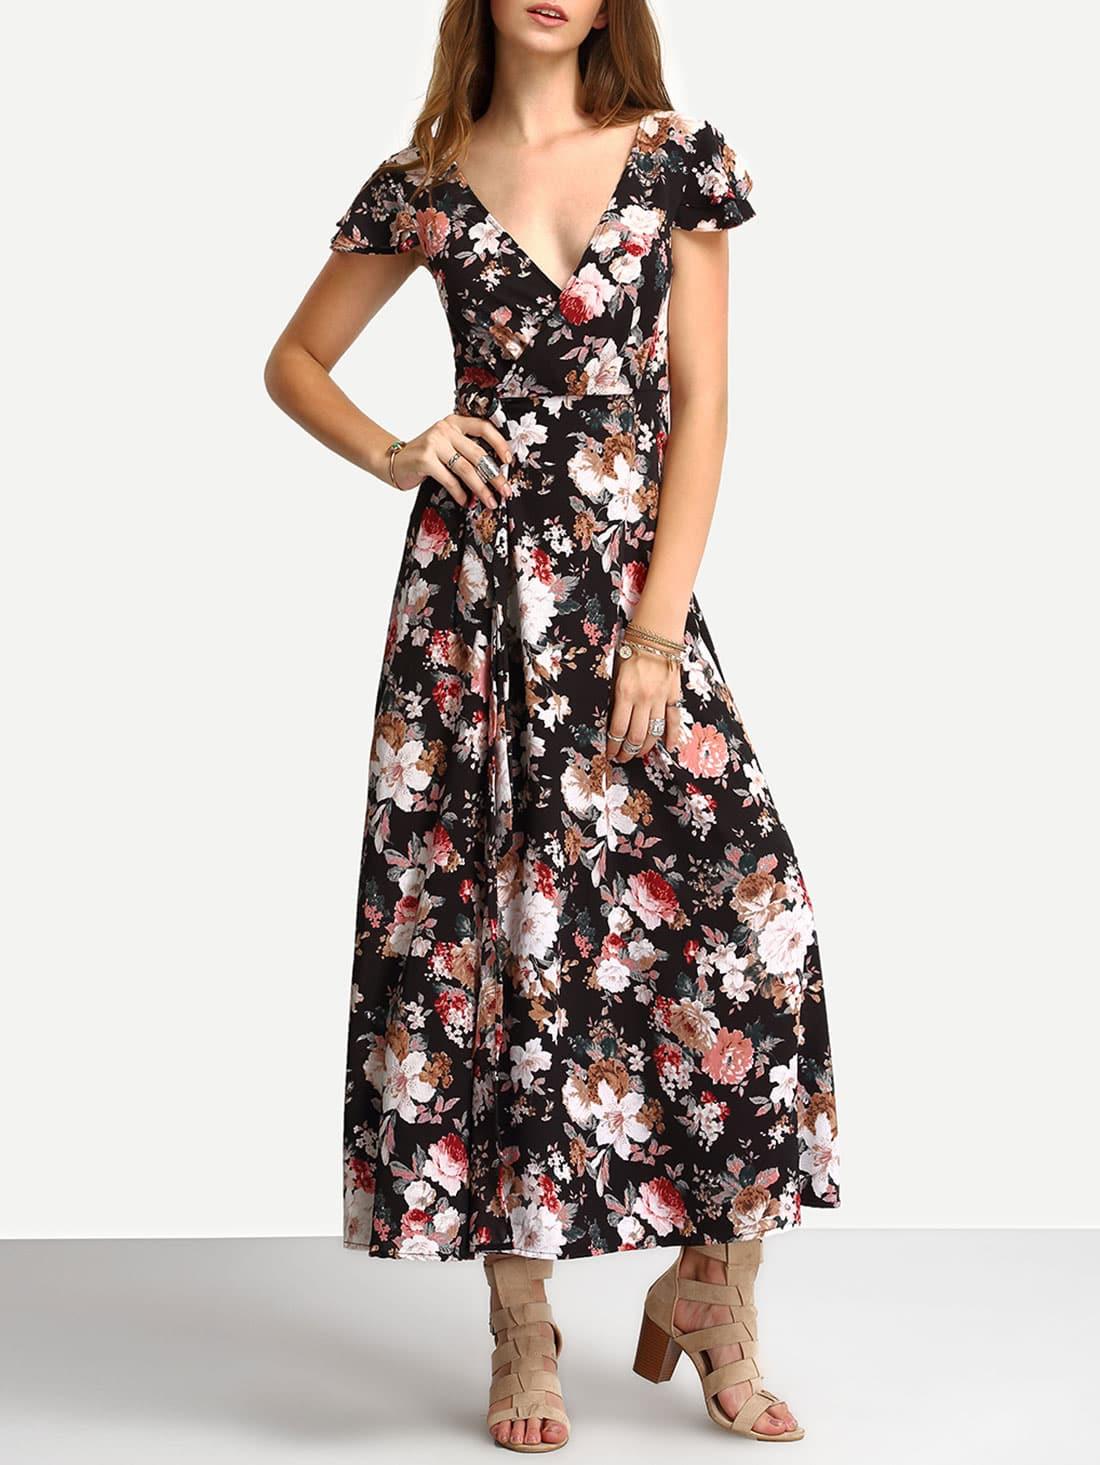 5552bbcdf4 Cheap Flower Print Self-Tie Lace-Up Long Dress for sale Australia ...